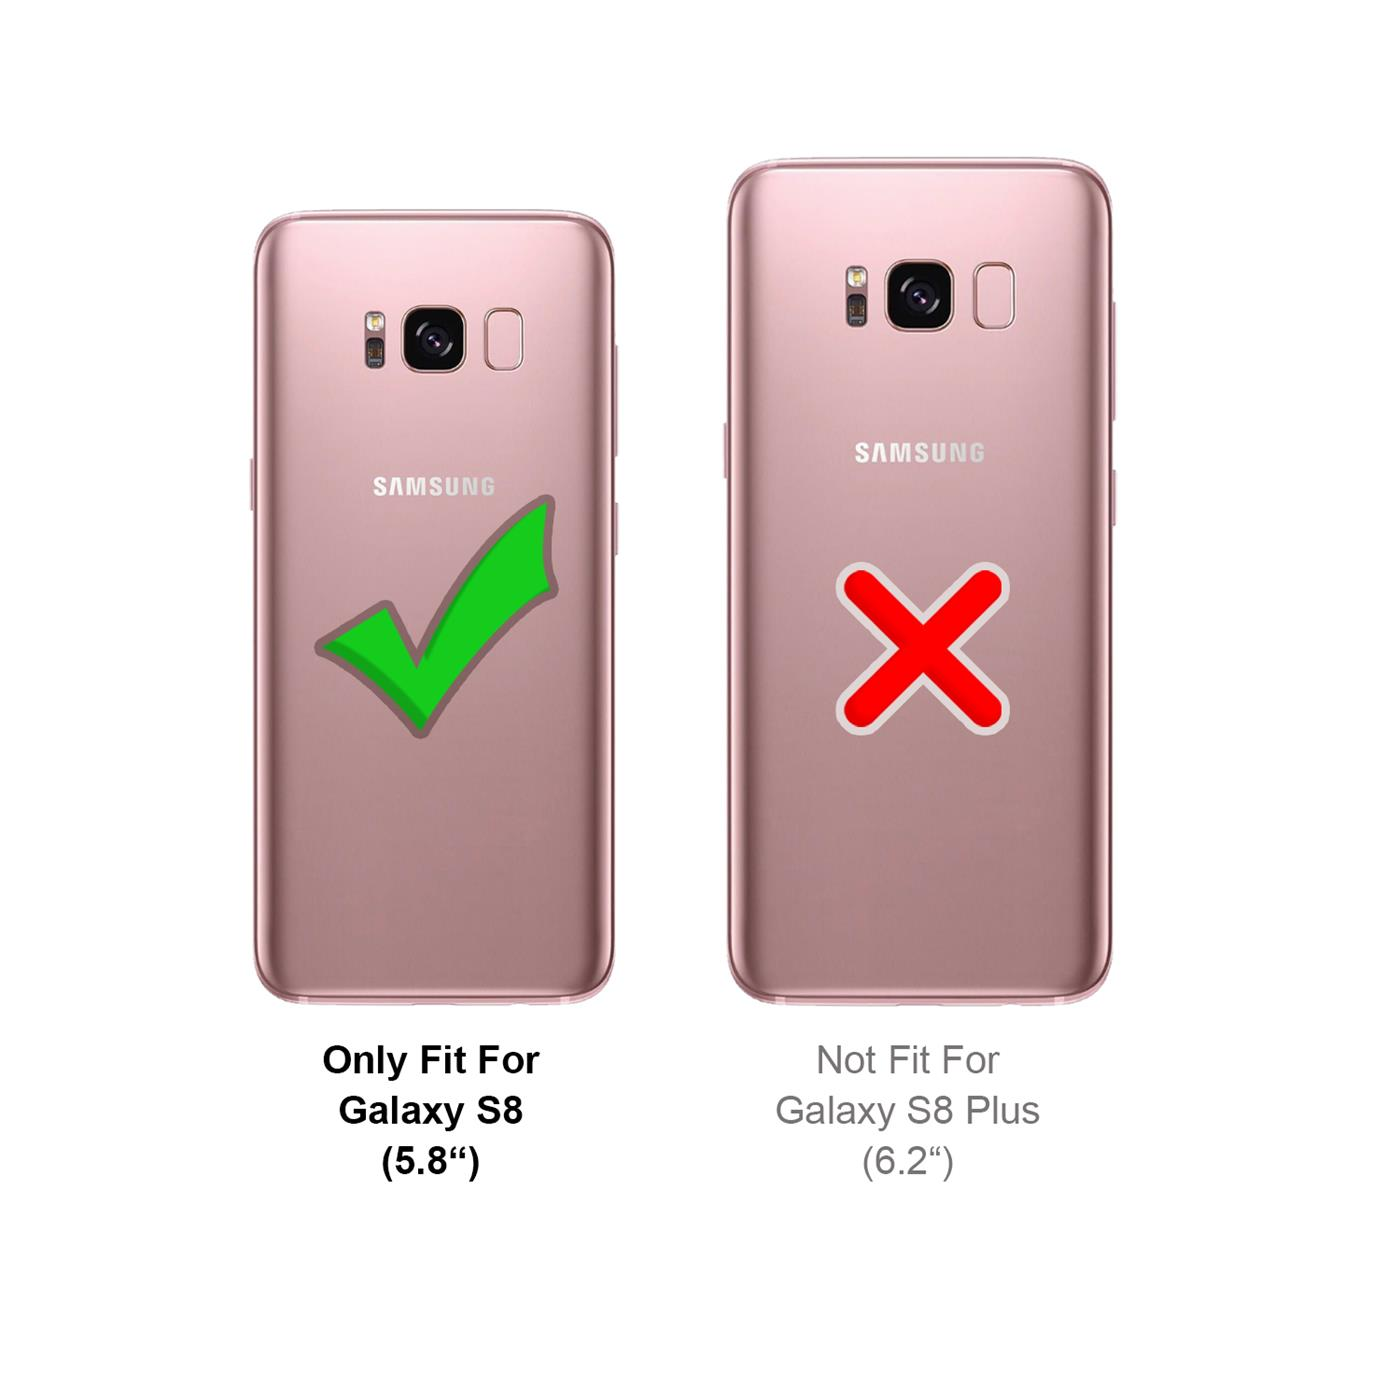 Hard-Back-Case-Cover-Samsung-Galaxy-j3-2016-duenn-Cover-Slim-Shockproof-Rugged Indexbild 7